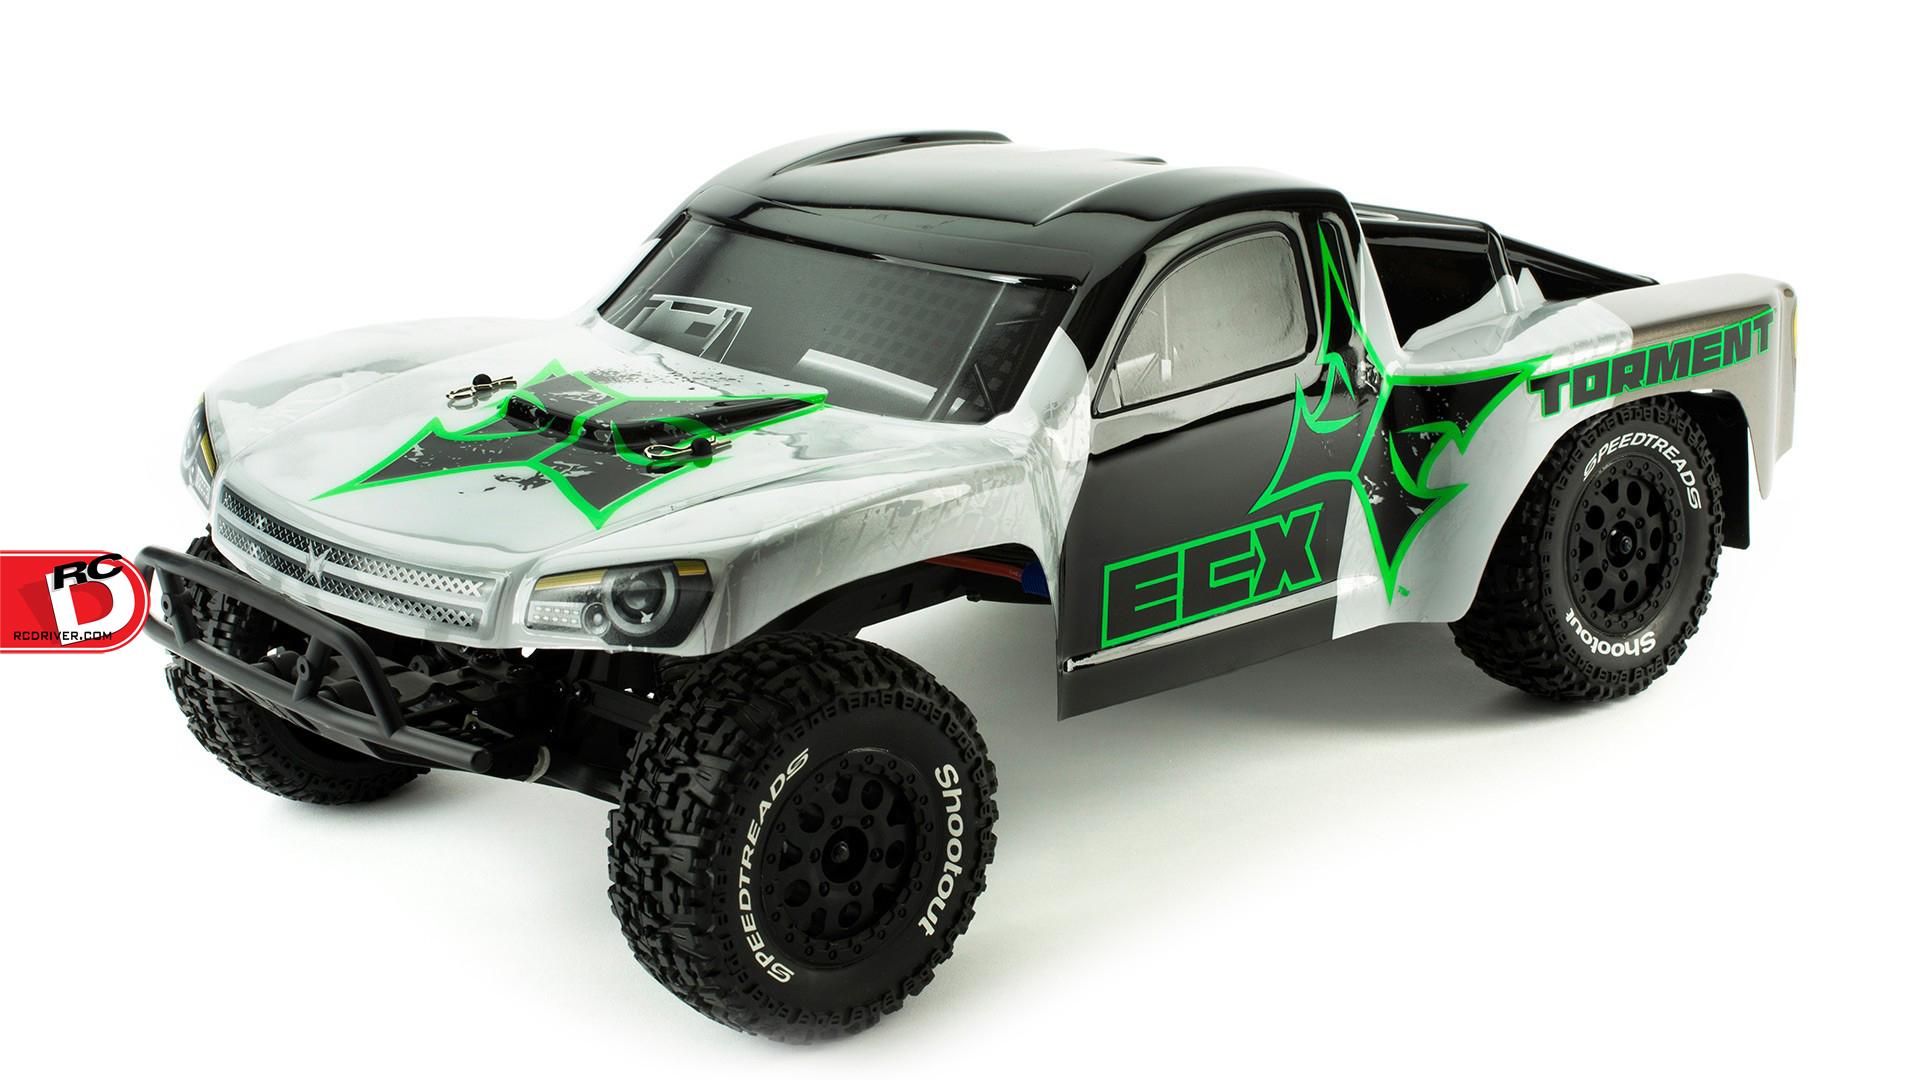 Ecx 2wd Vehicles Get The 2 1 Treatment